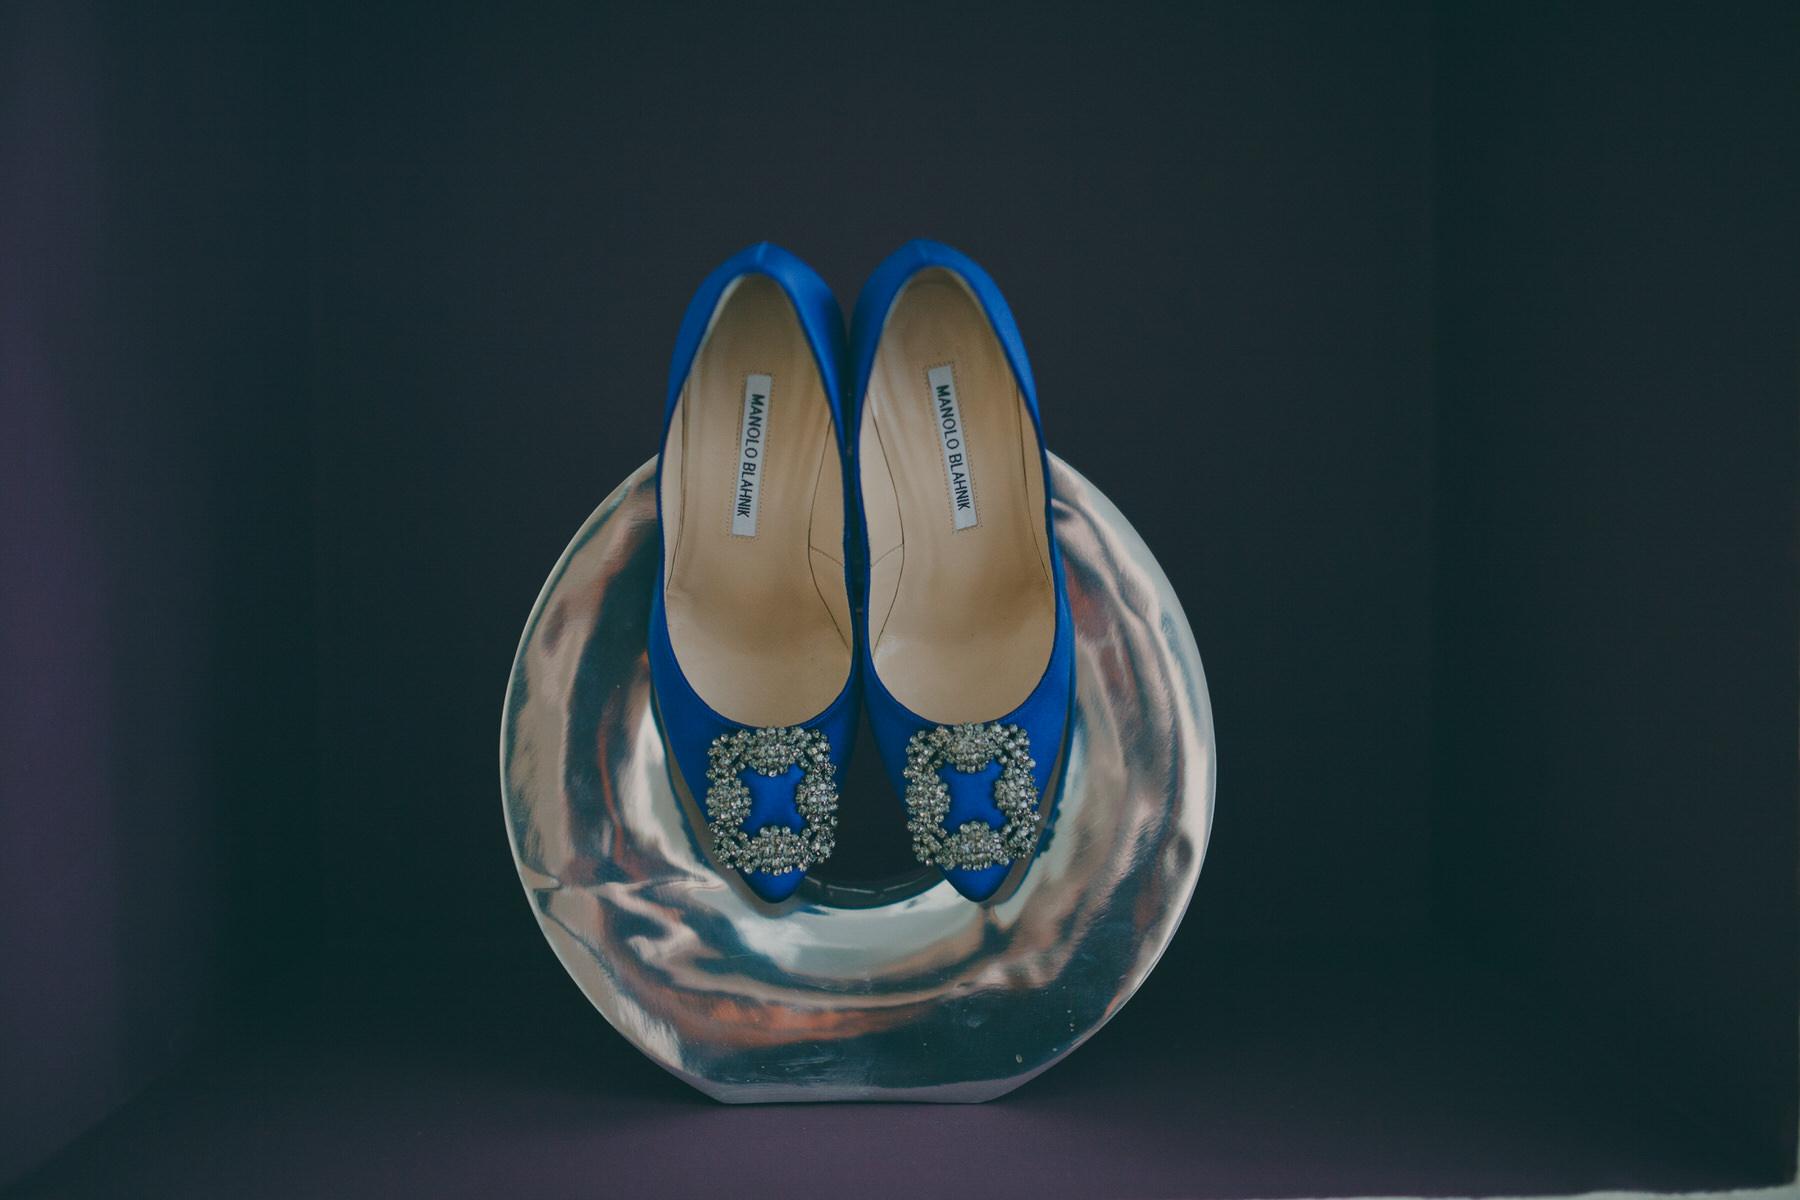 25 blue Manolo Blahnik wedding shoes silver sculpture.jpg